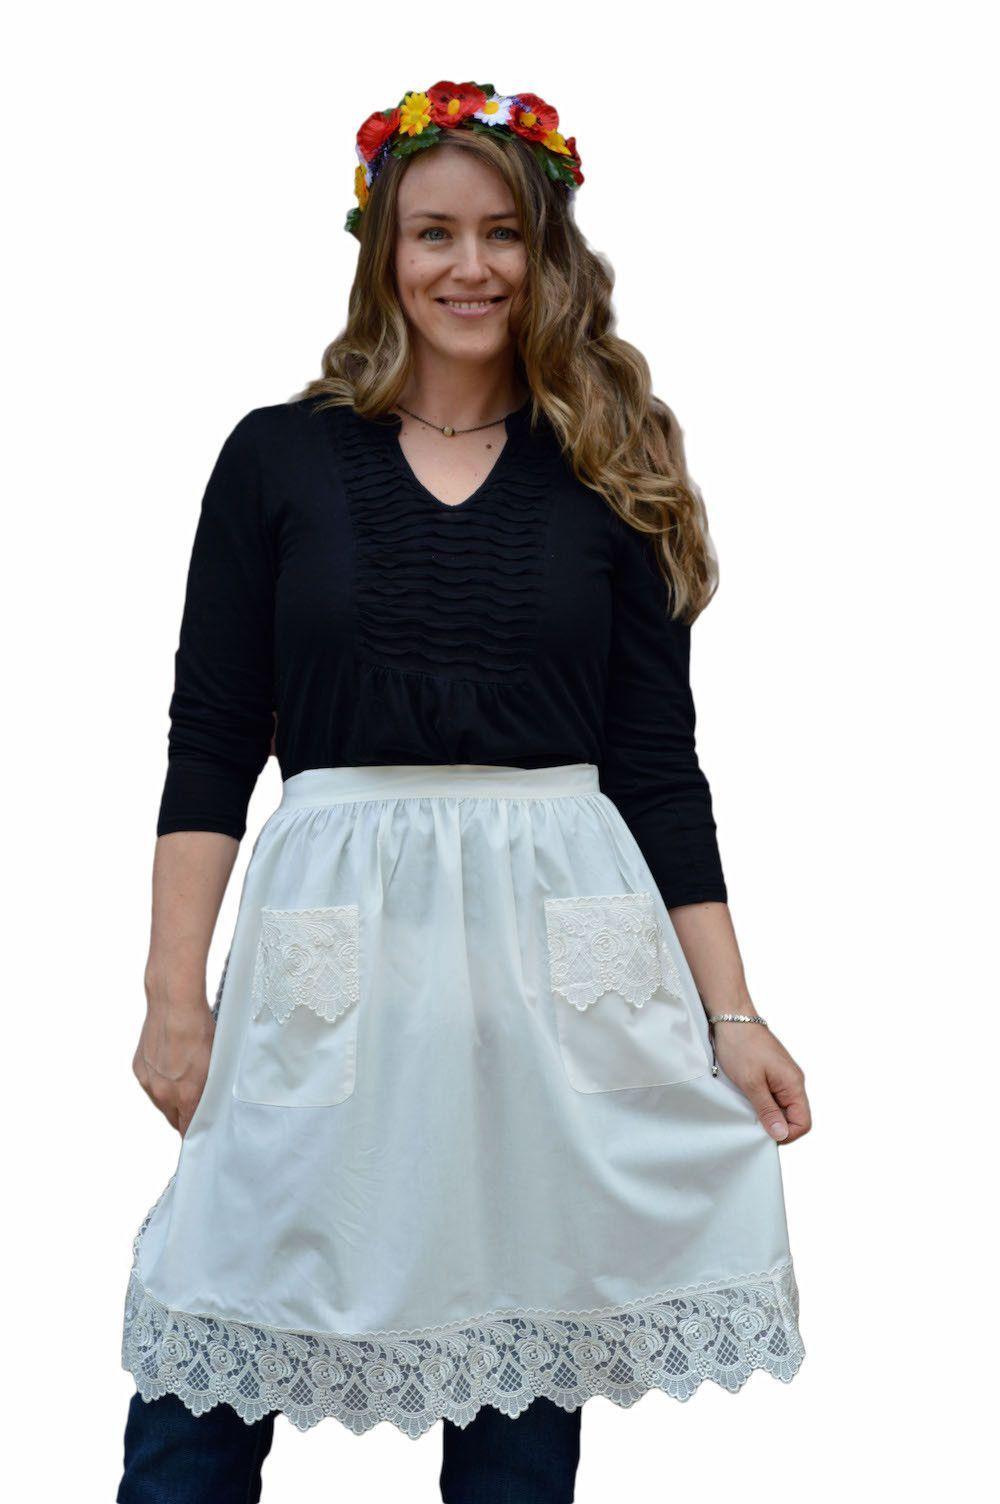 White apron maid - Dutch Lace Adult Half Apron White Maid Costume